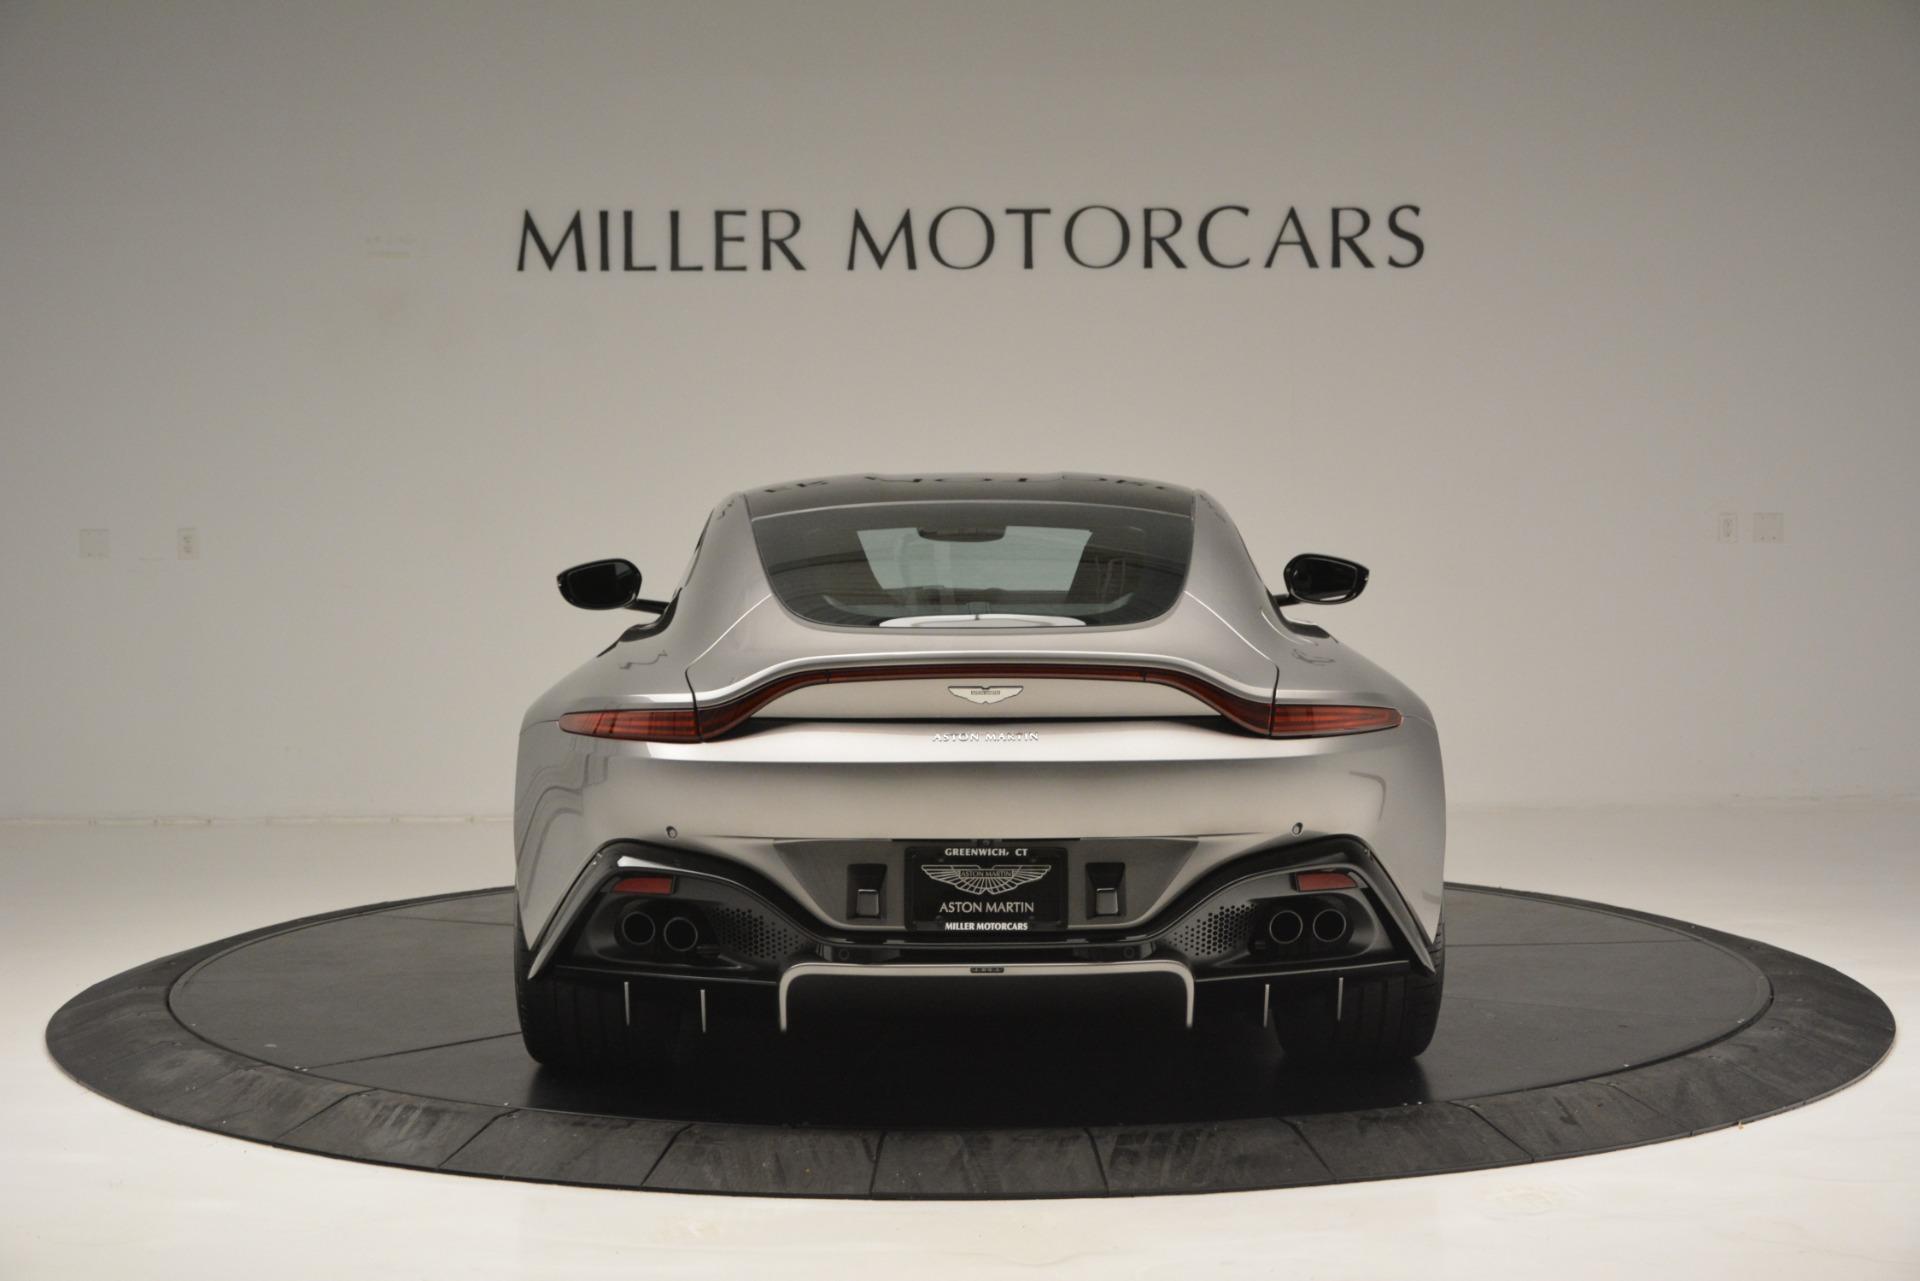 New 2019 Aston Martin Vantage Coupe For Sale In Greenwich, CT. Alfa Romeo of Greenwich, A1335 3122_p6